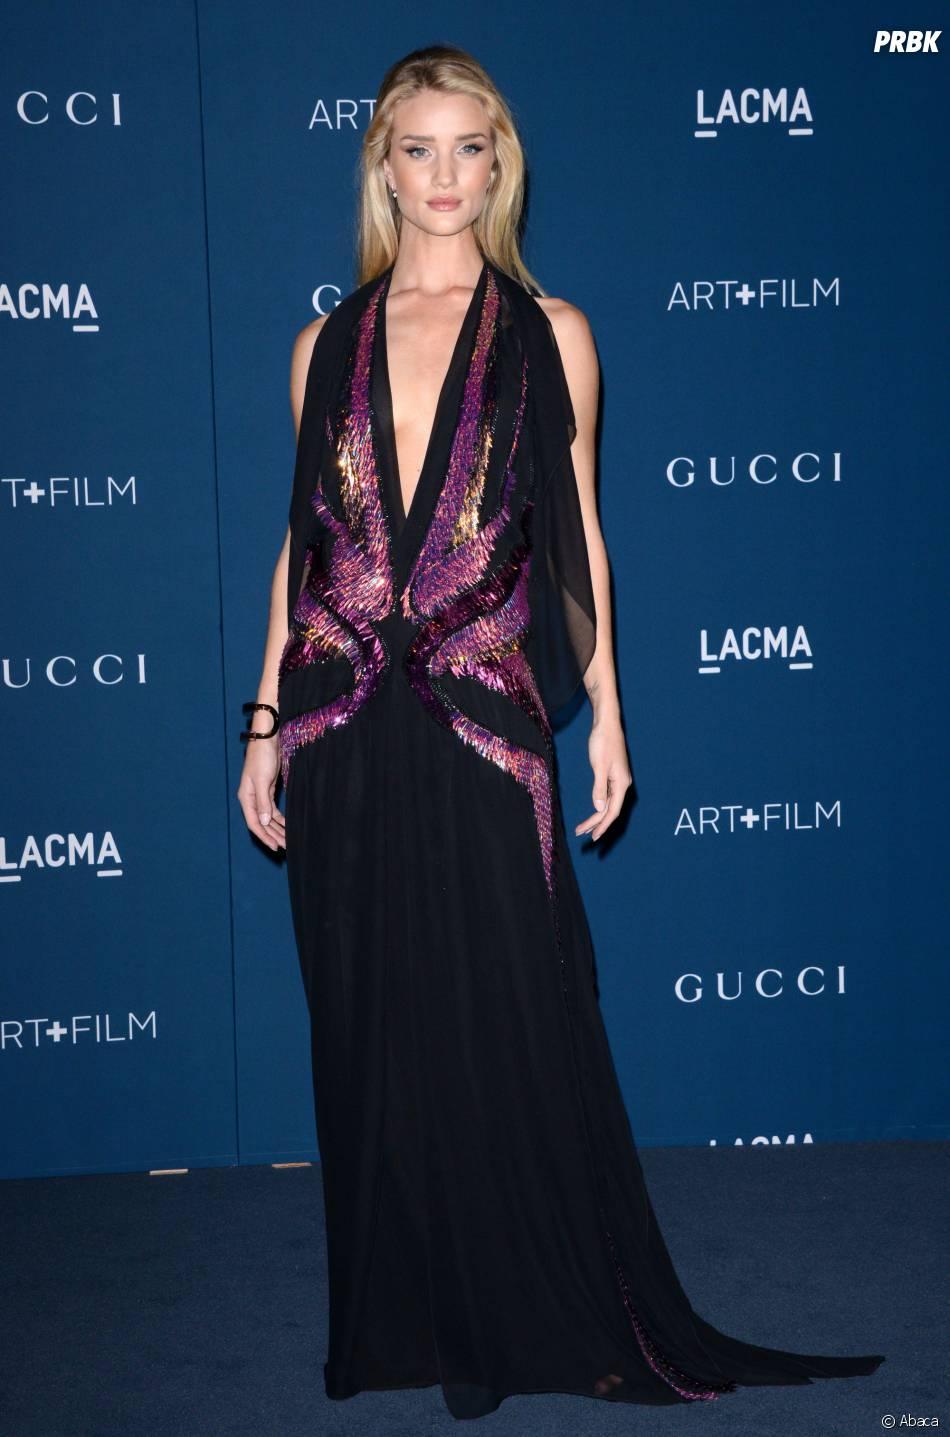 Rosie Huntington-Whiteley pour honorer Martin Scorsese aux LACMA le 2 novembre 2013